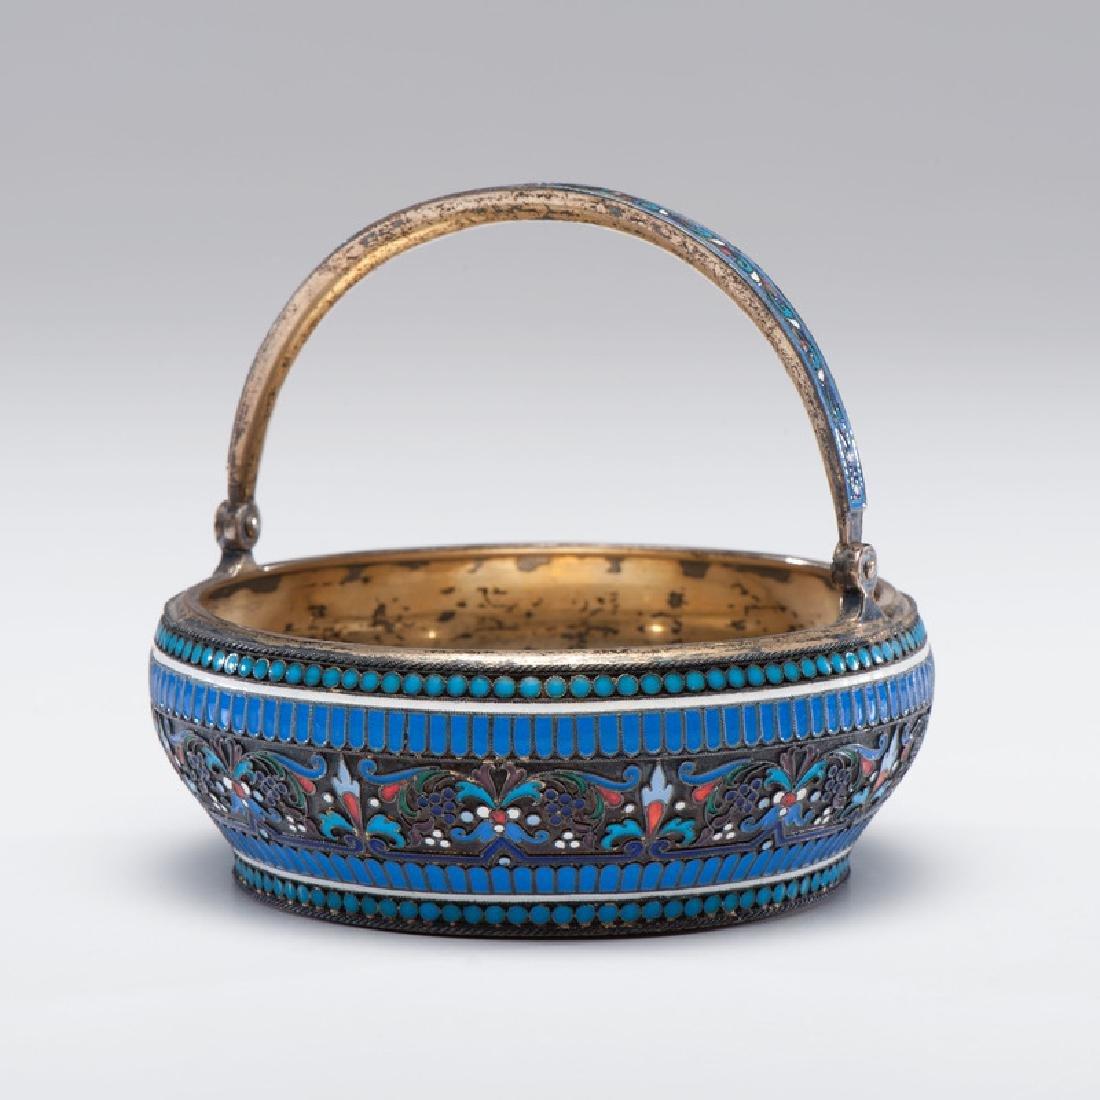 Russian Silver-Gilt and Enamel Basket